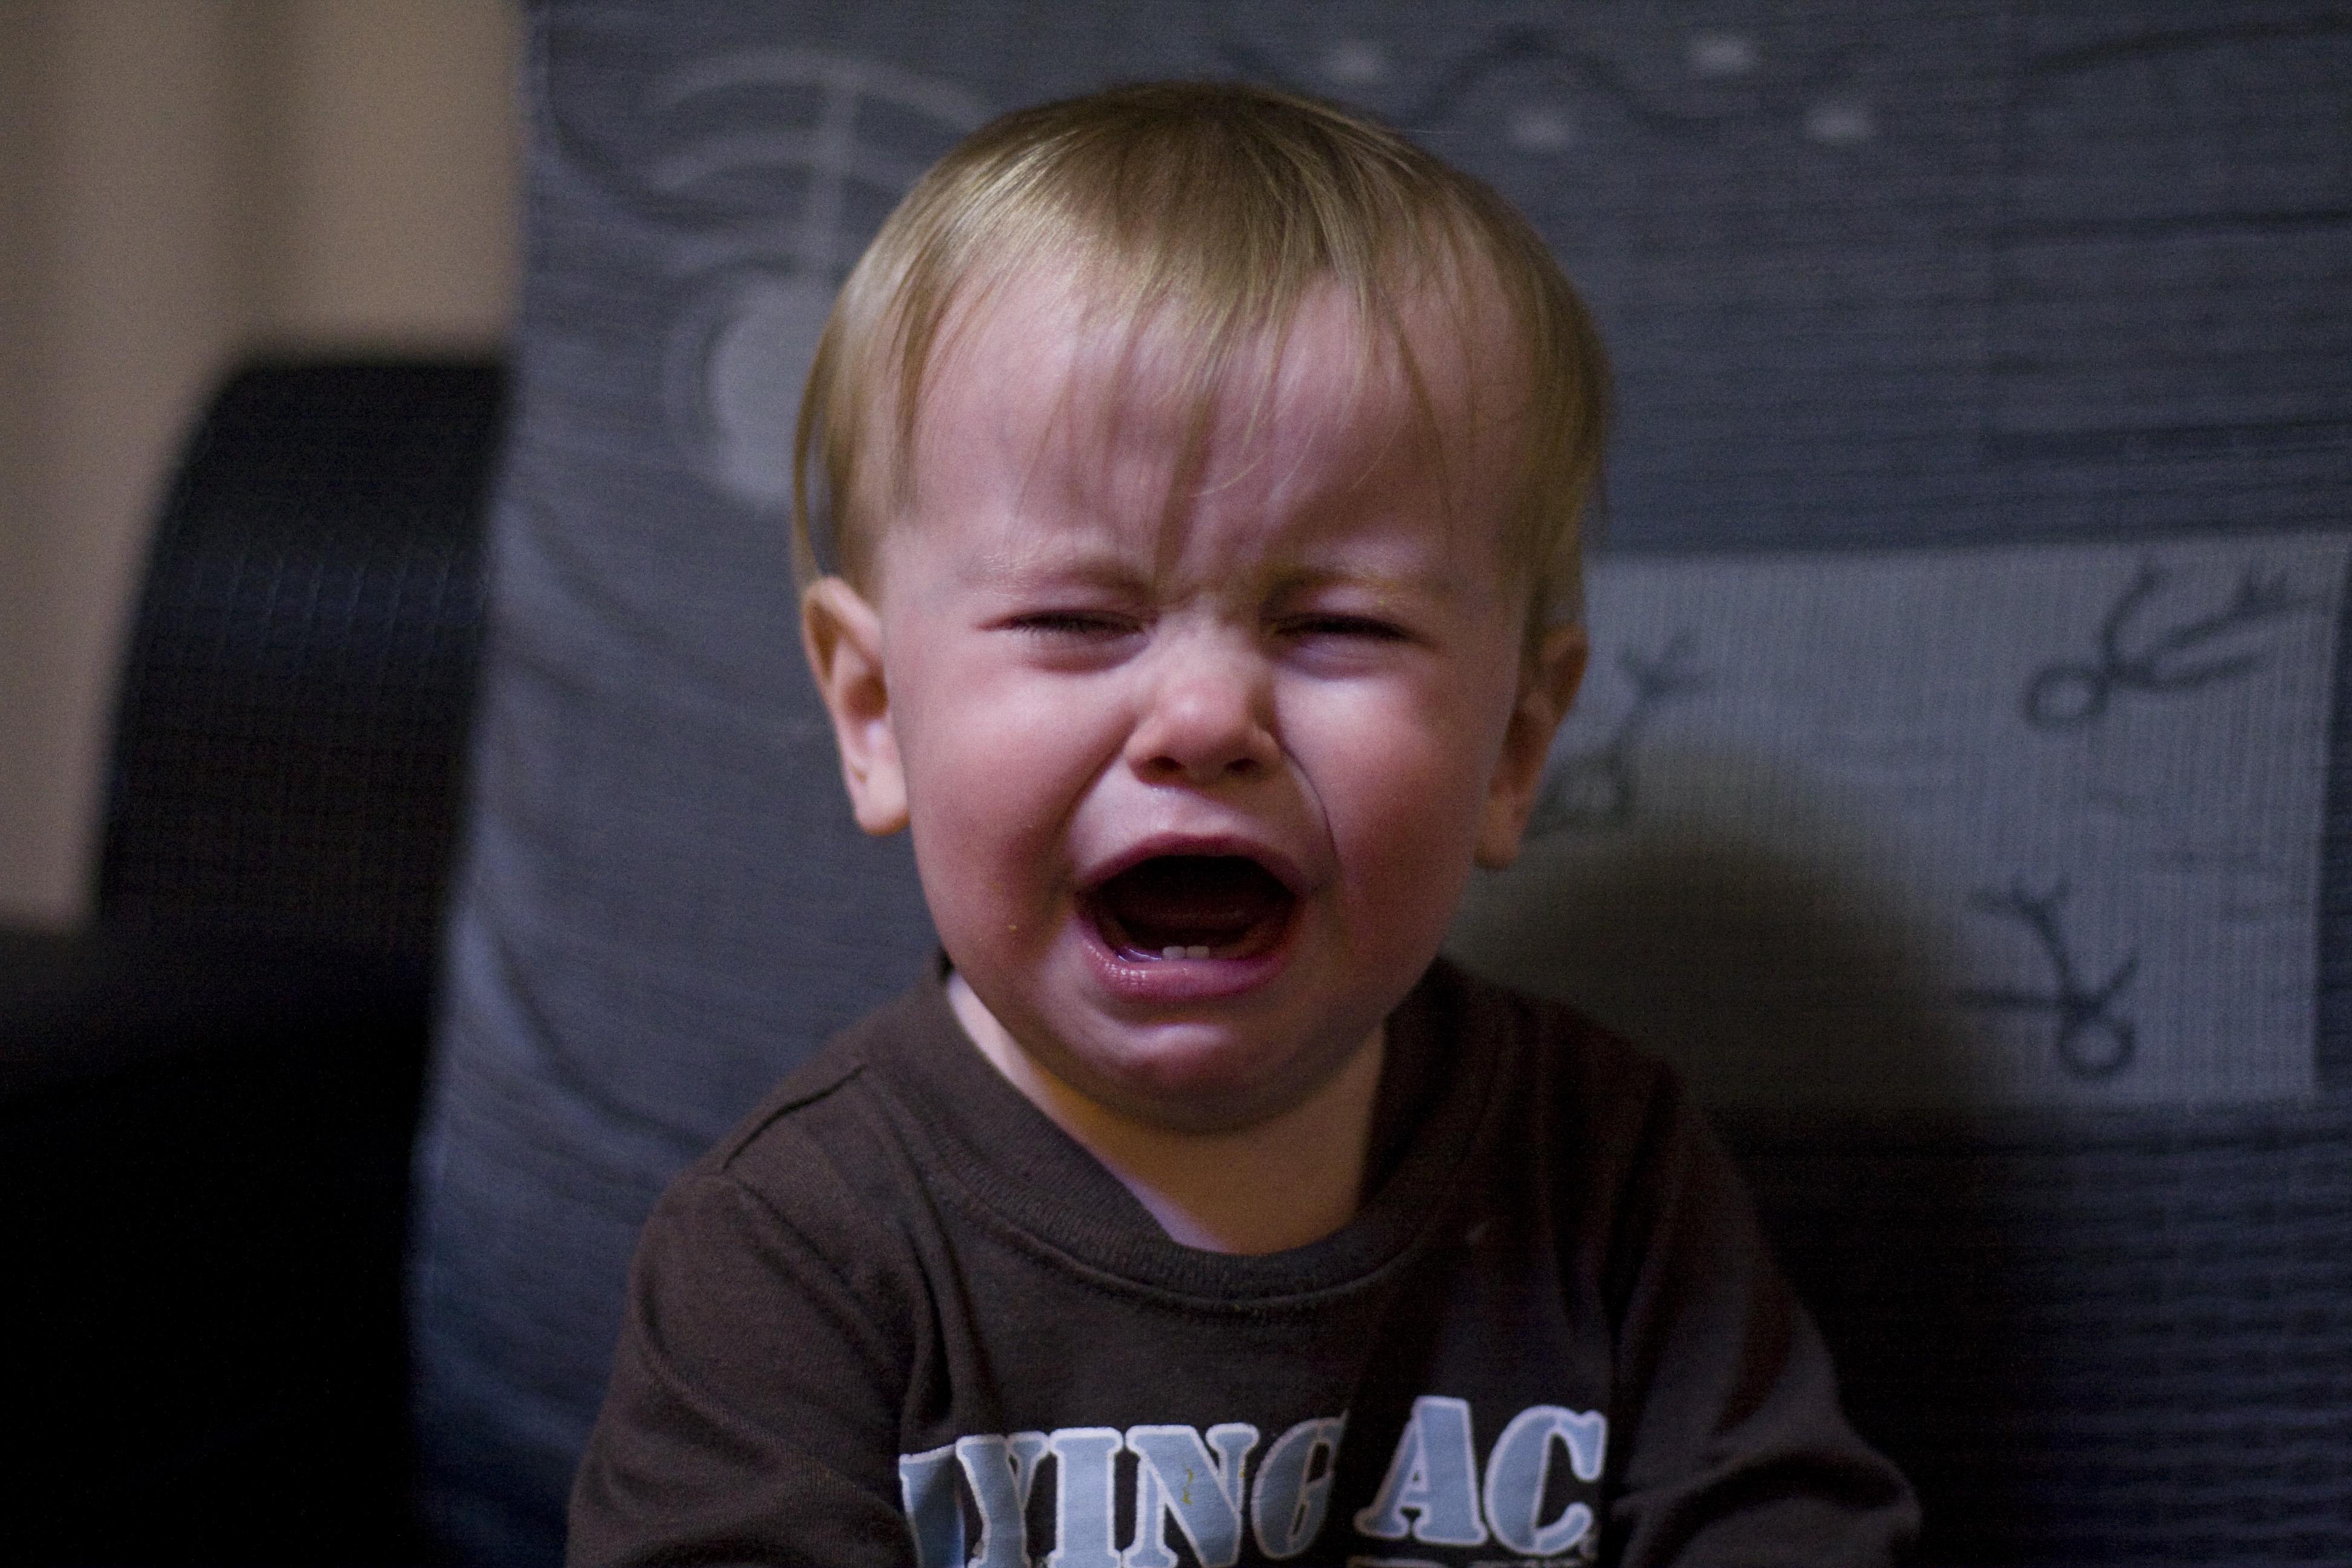 crying_baby_leo_562572.jpg